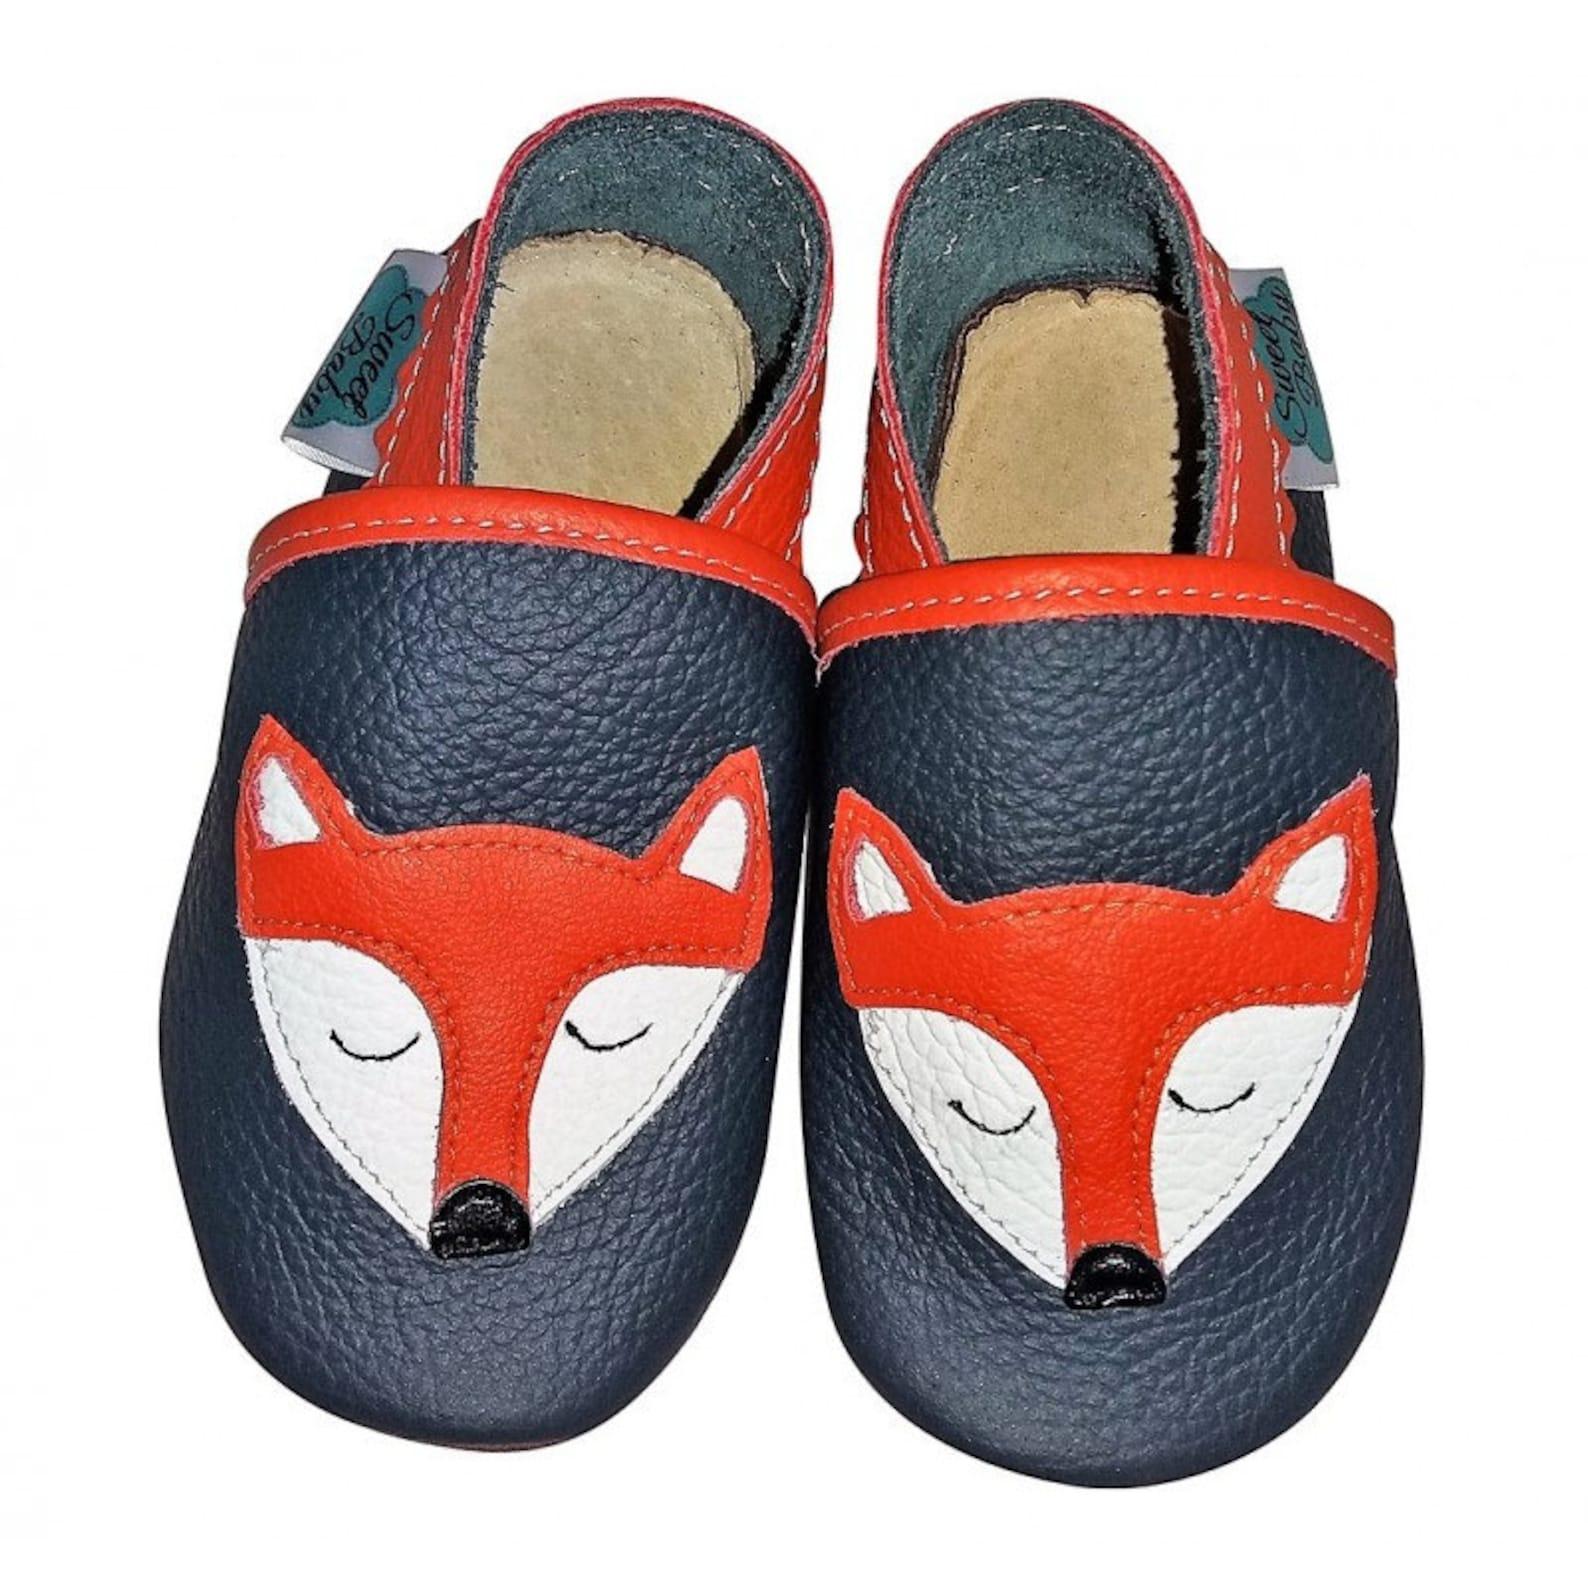 paputki, slippers, ballets leather size. 16-20